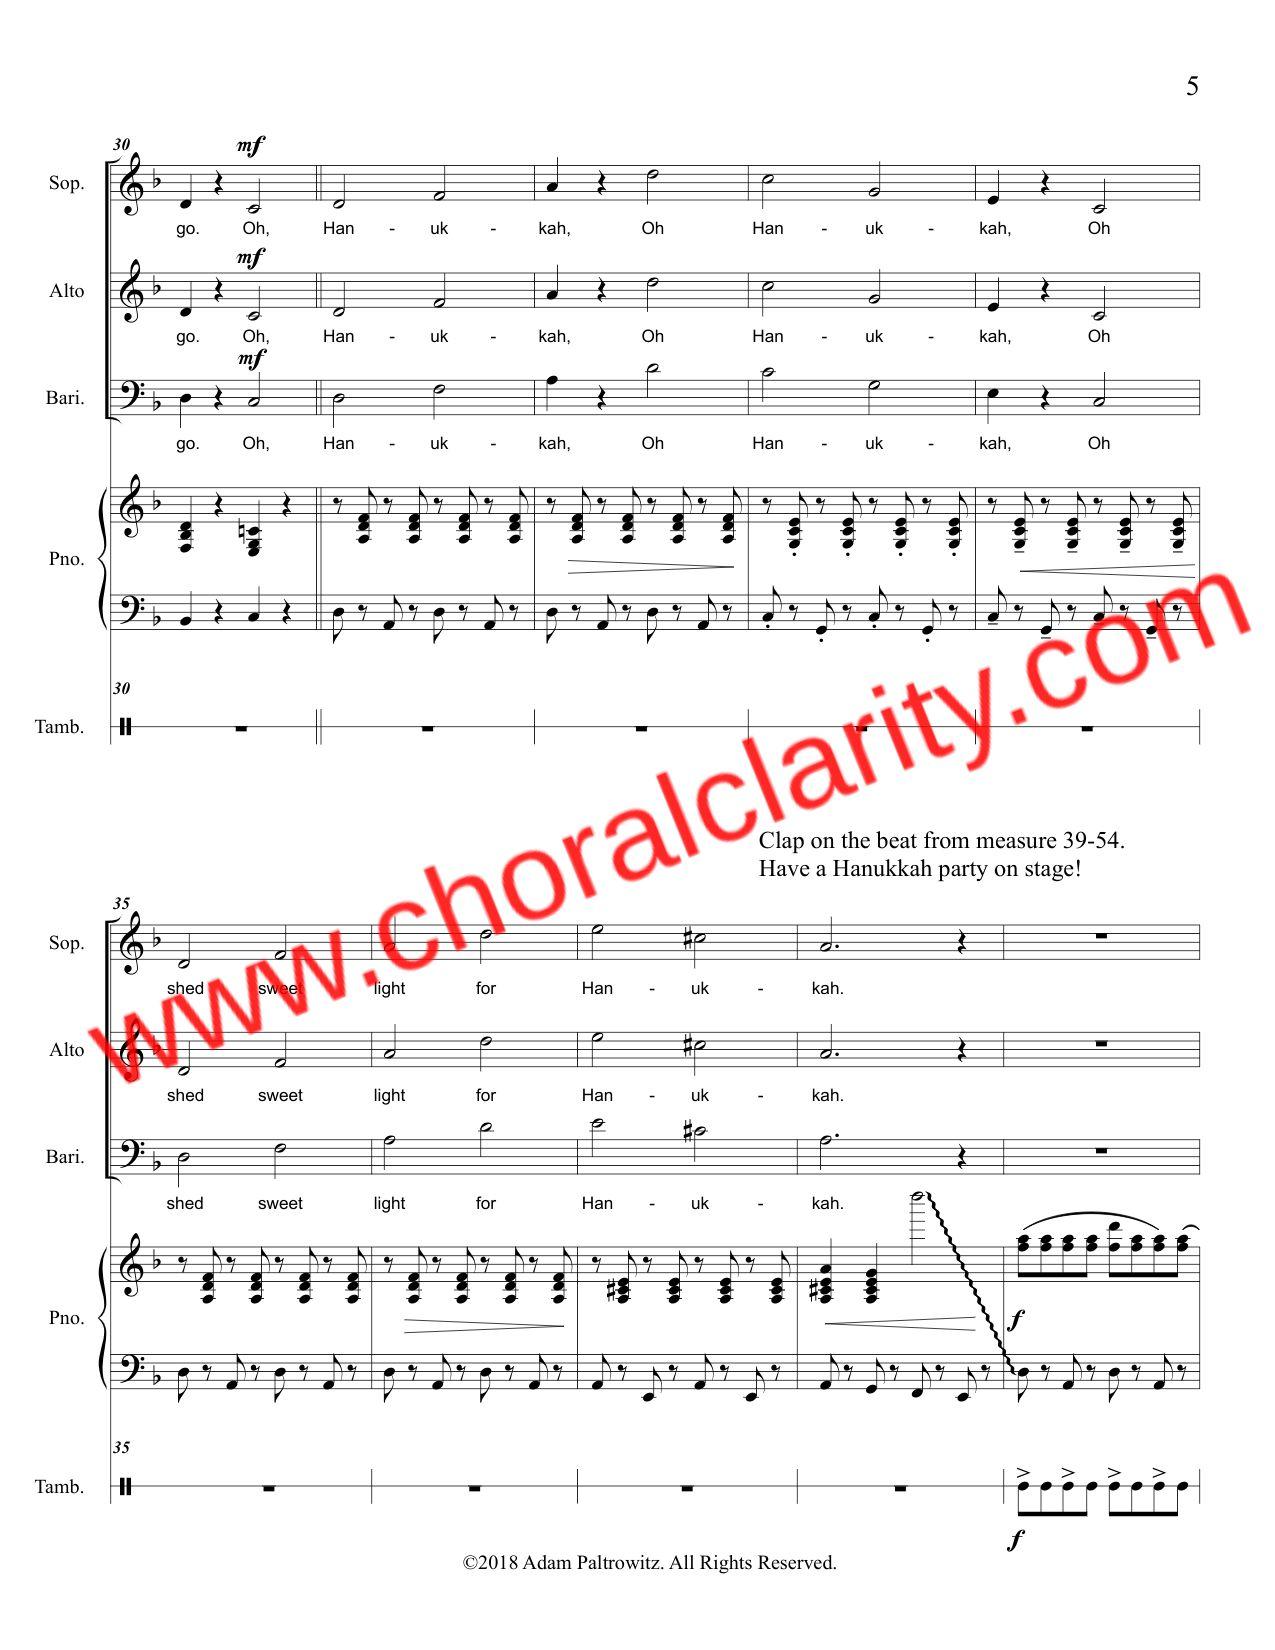 Choral Clarity WatermarkOh Hanukkah SAB-5